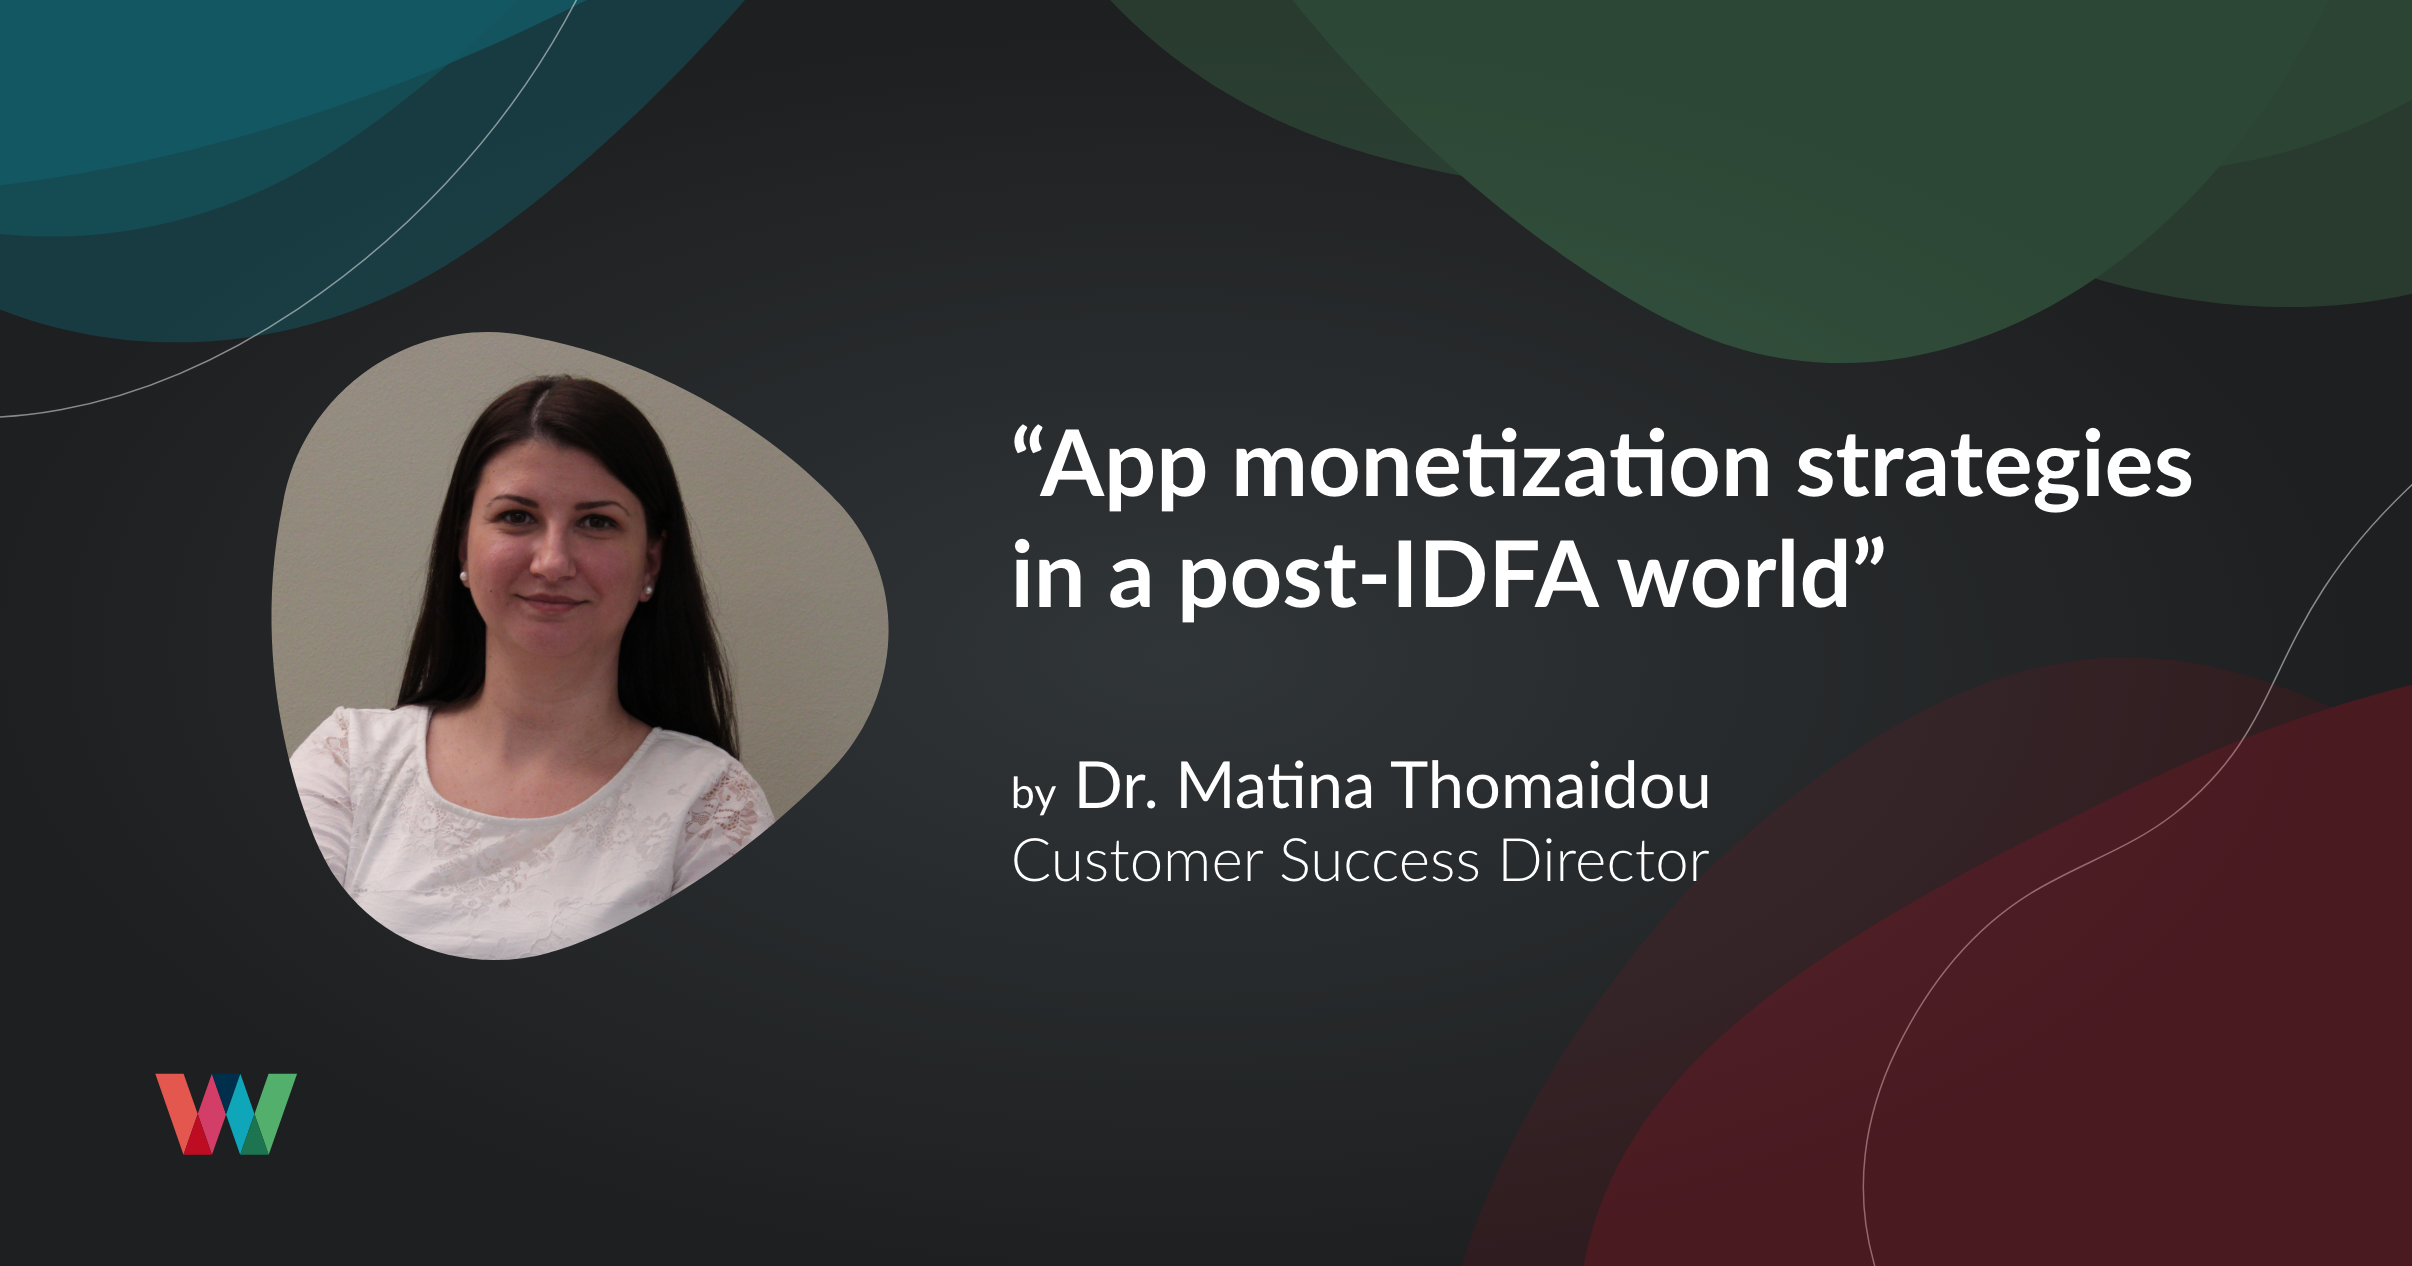 App monetization strategies in a post-IDFA world